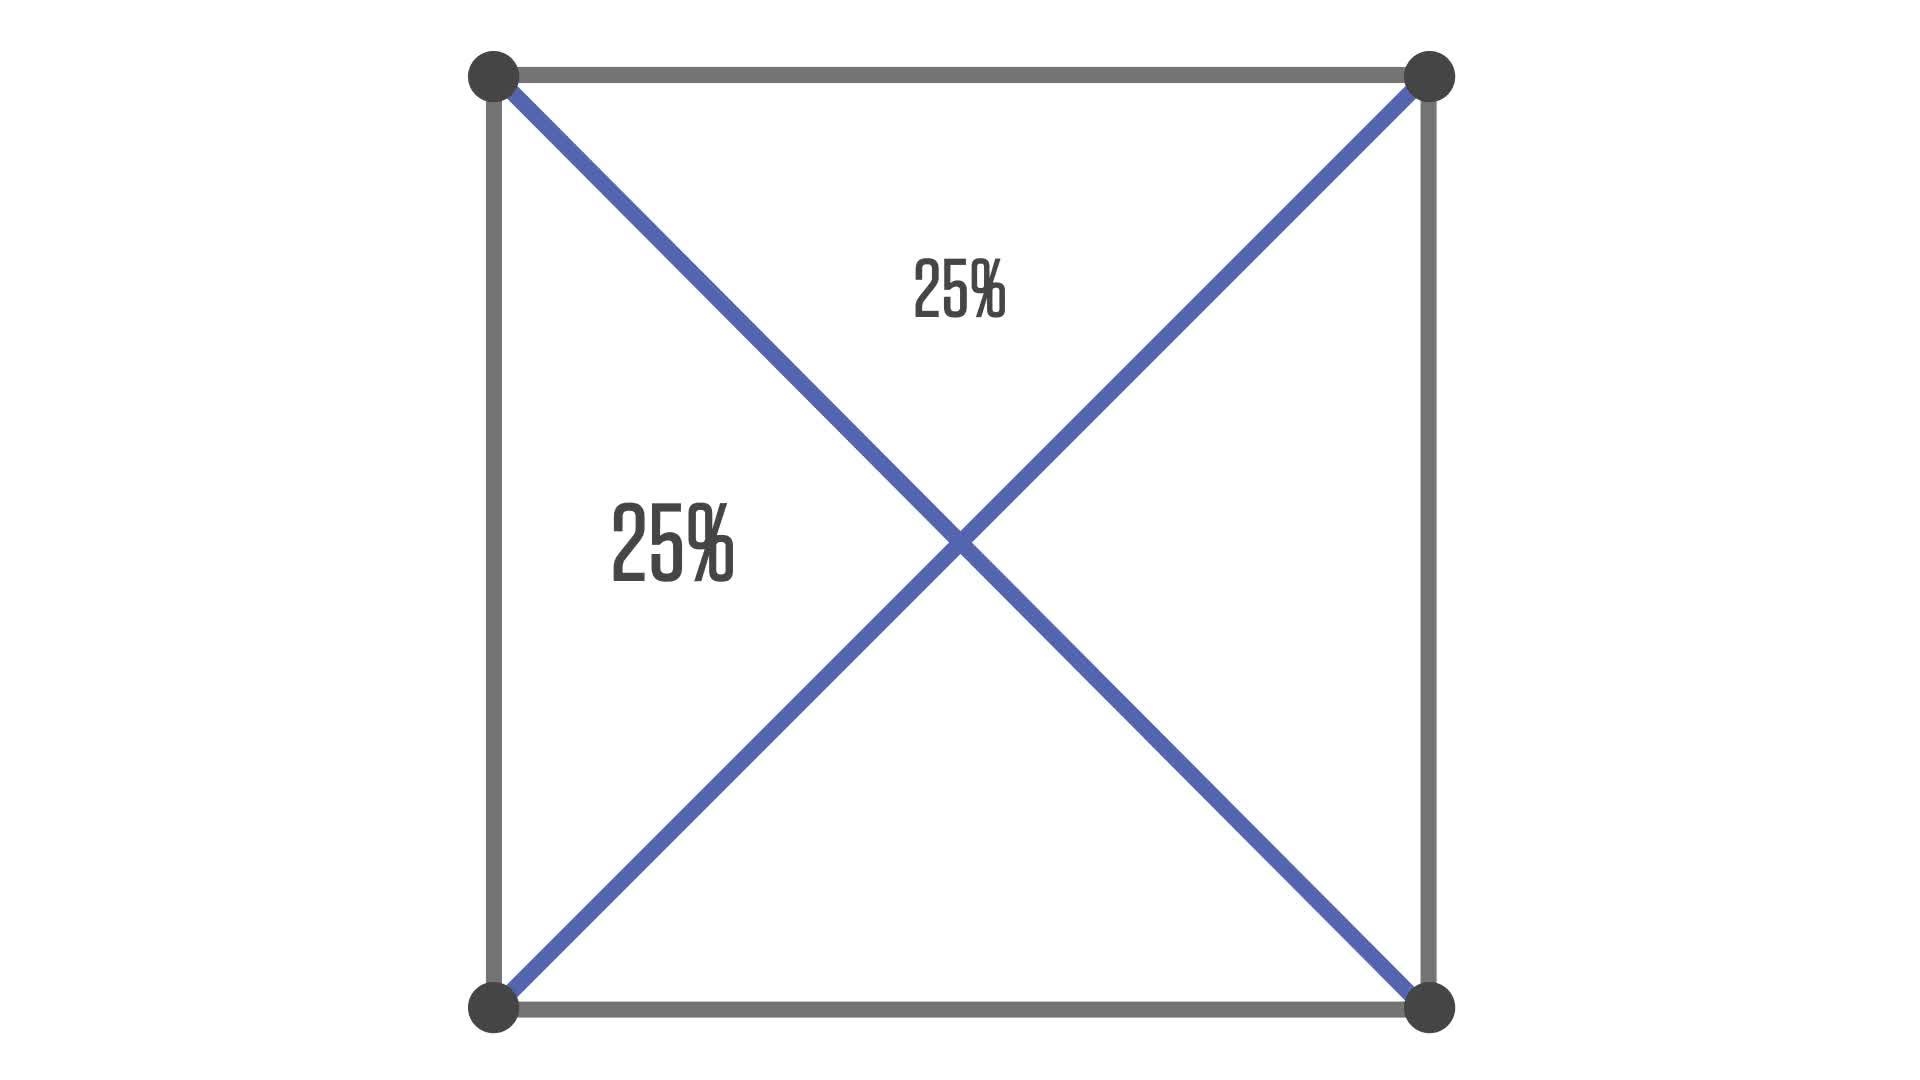 Square Partitions